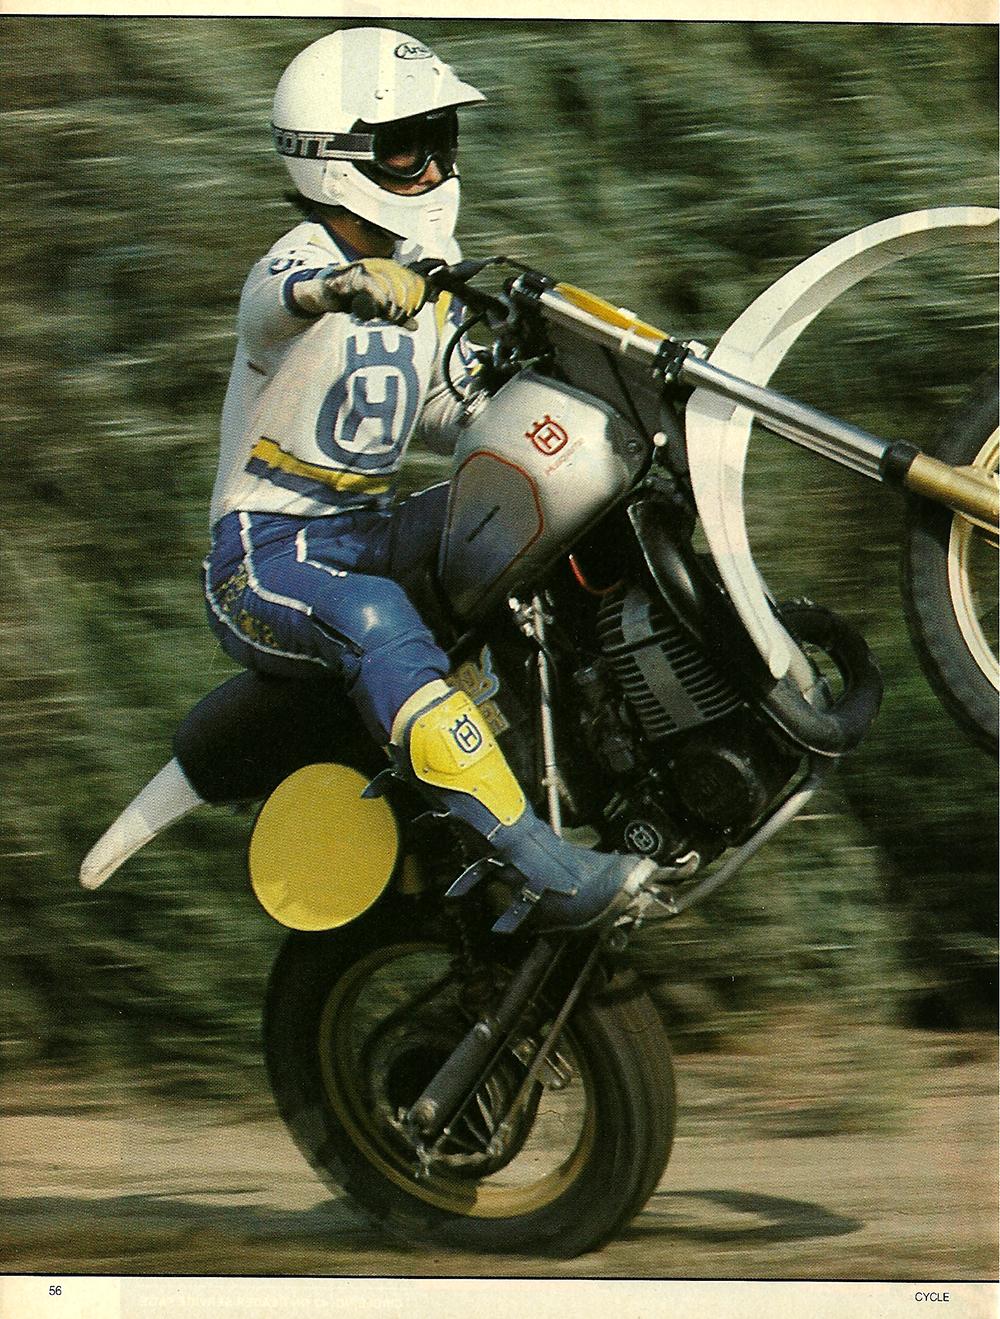 1983 Husqvarna 500 CR road test 1.jpg